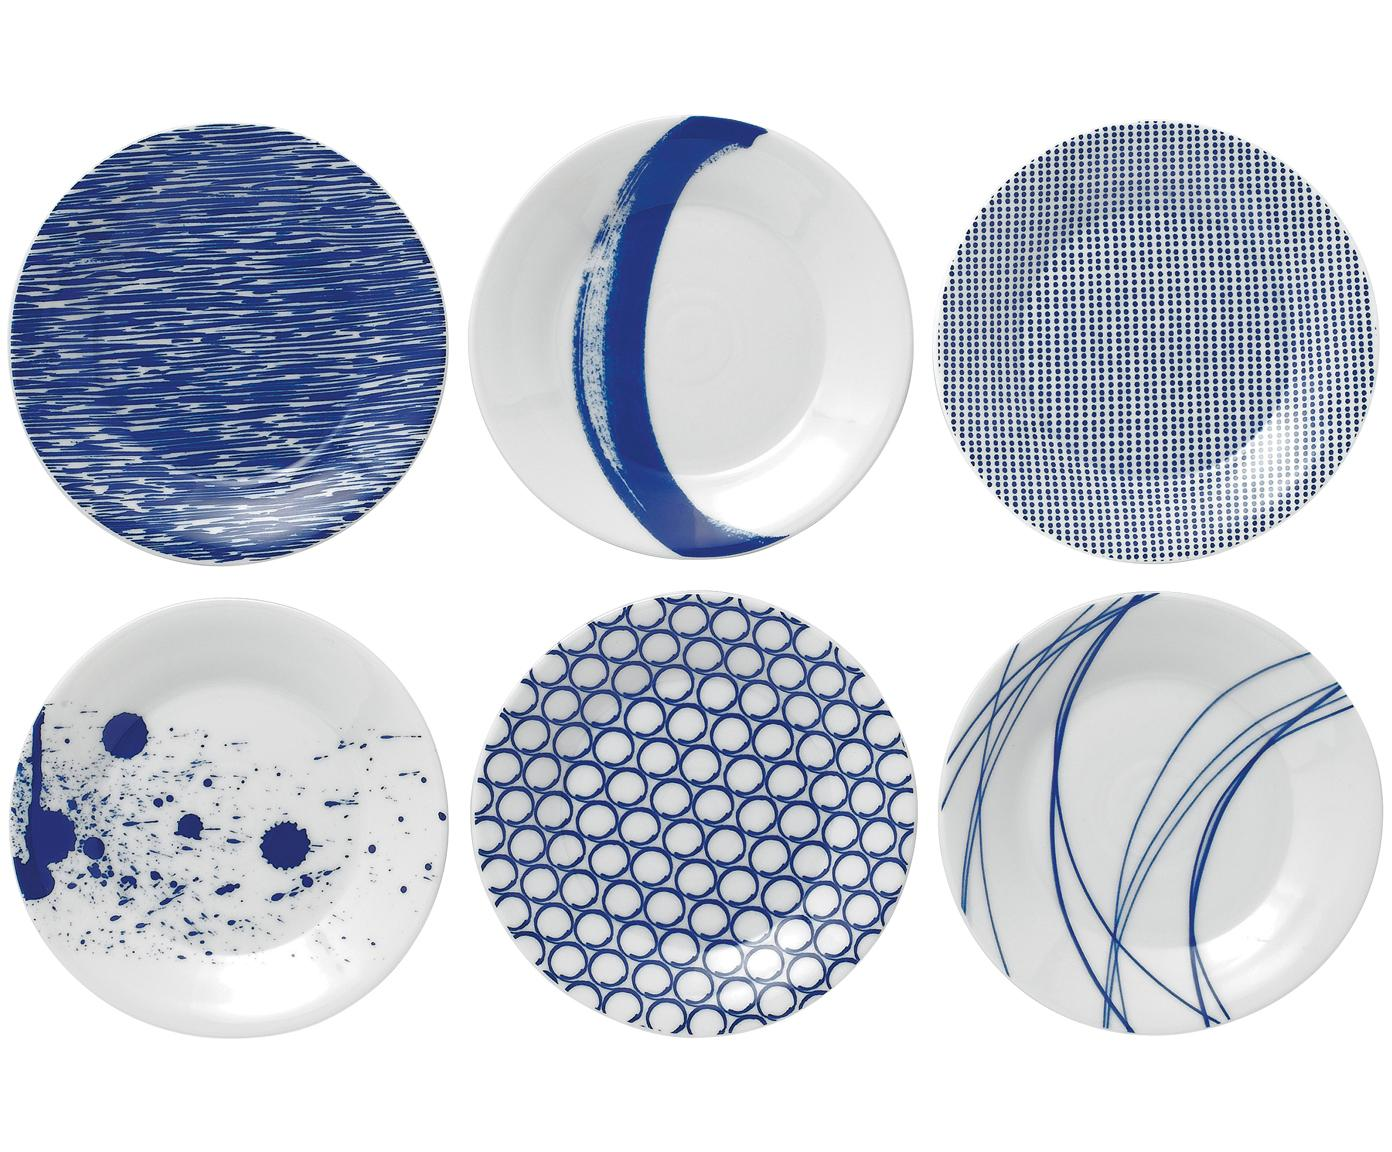 Set de platos de pan Pacific, 6pzas., Porcelana, Blanco, azul pacifico, Ø 16 cm